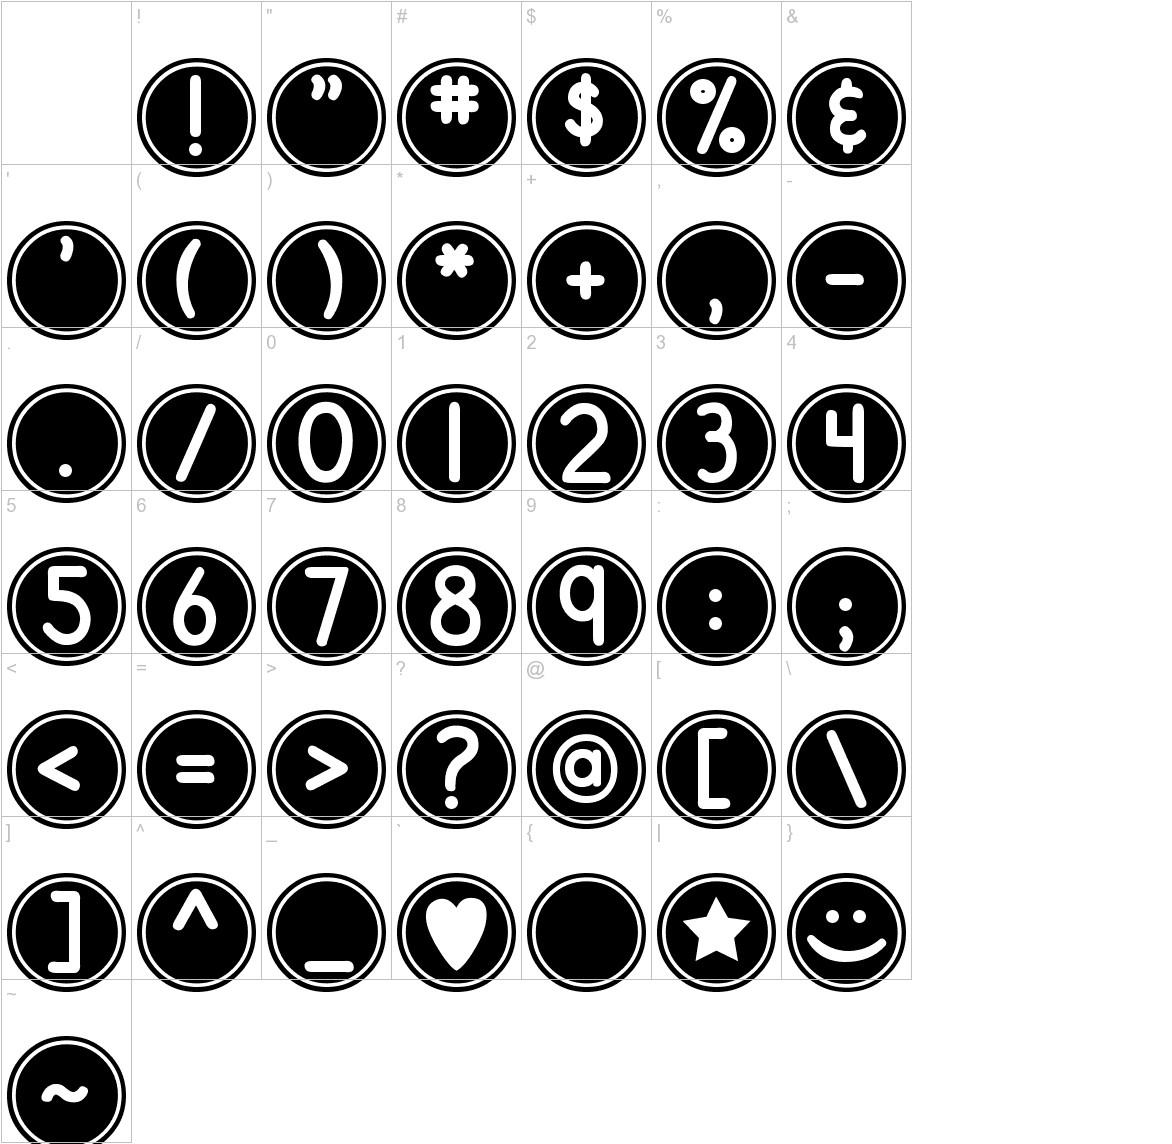 DJB Pokey Dots characters